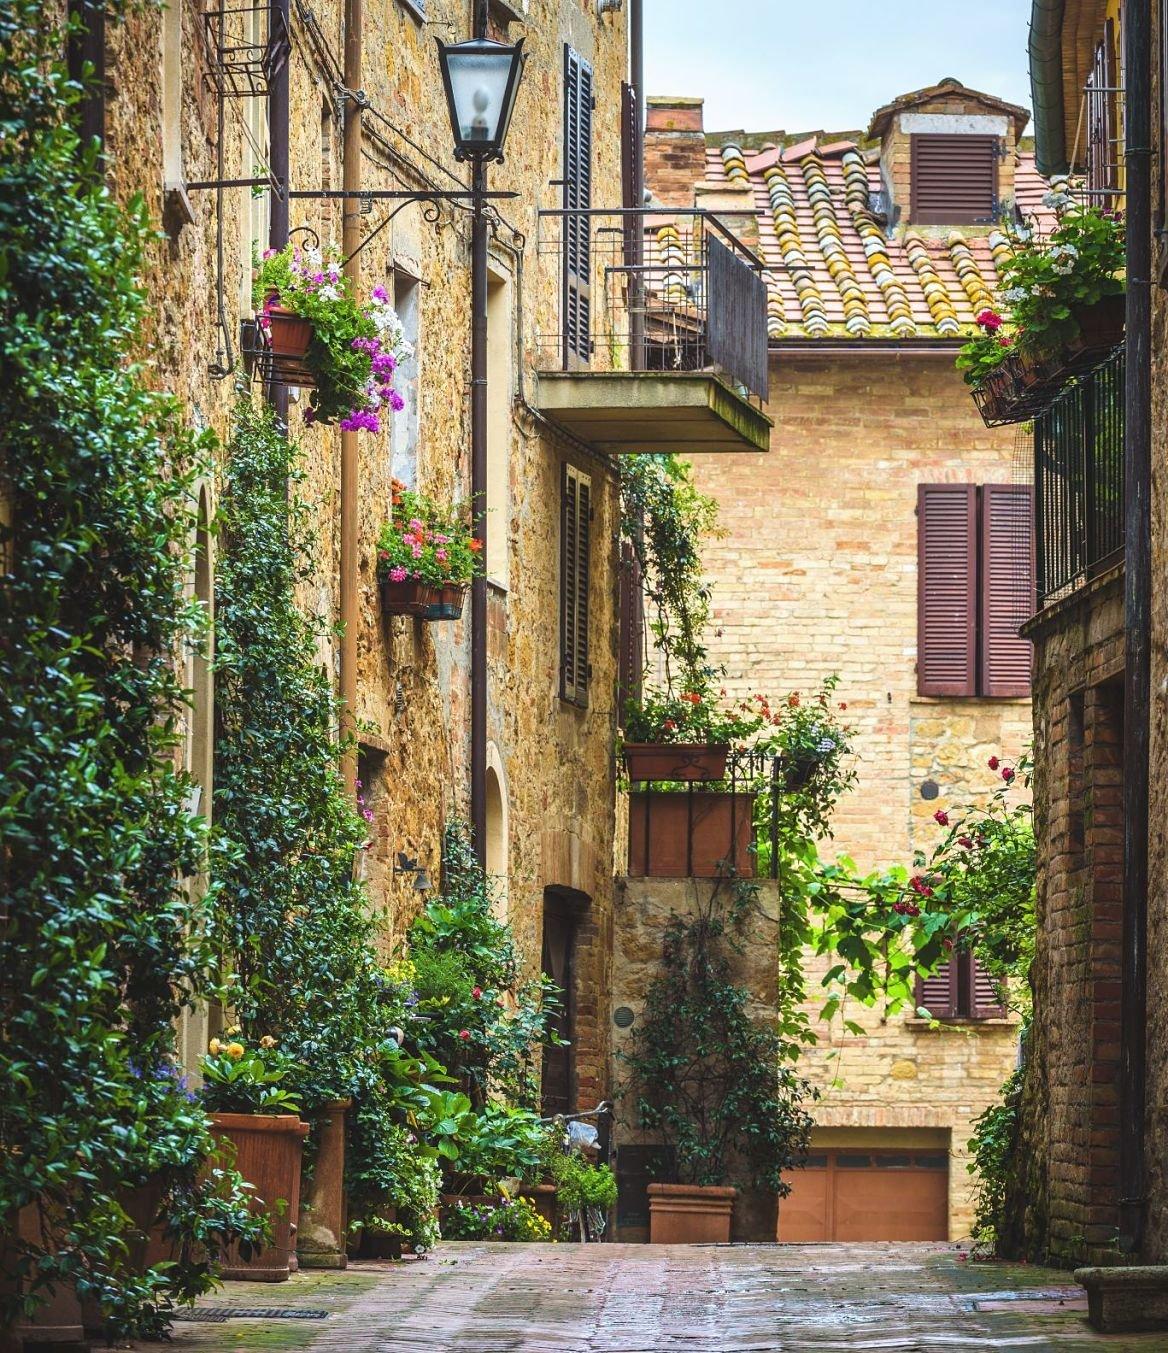 Une ruelle fleurie de Pienza en Toscane, Italie.